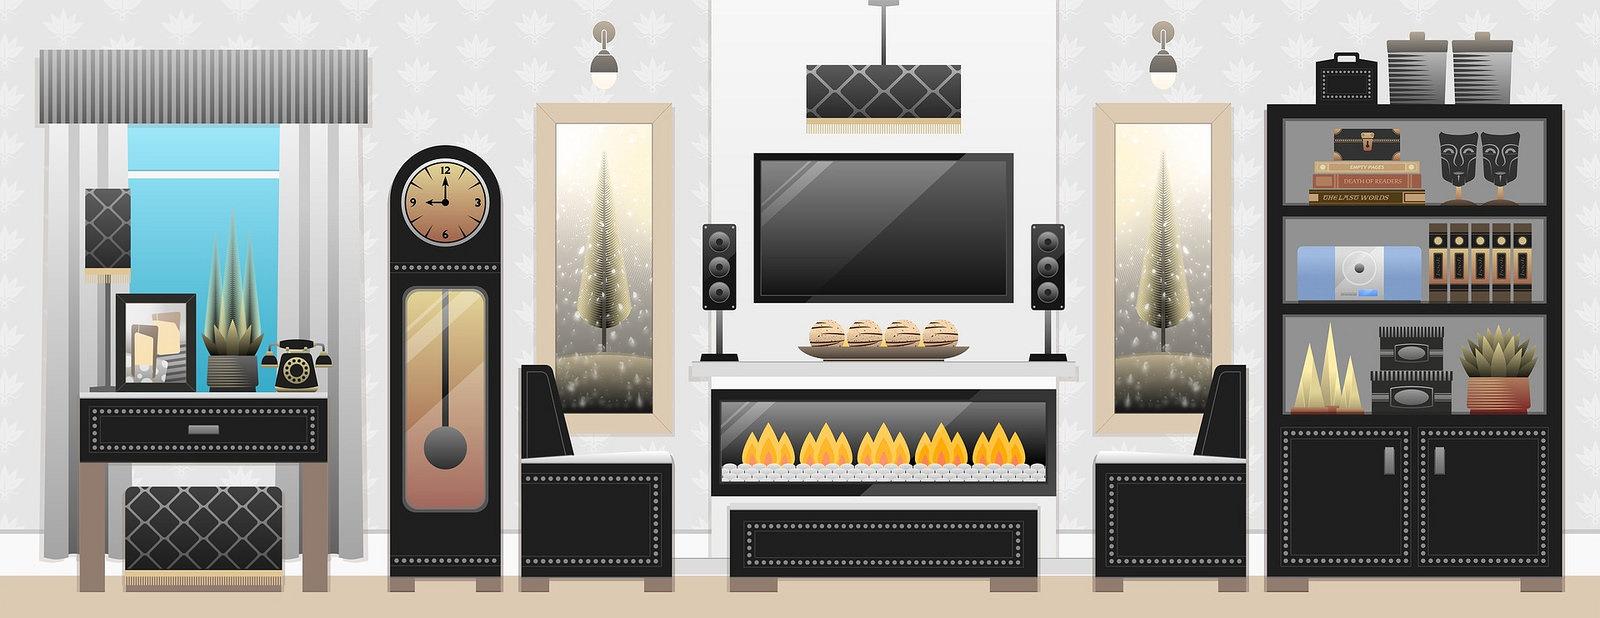 Why Should You Hire An Interior Designer NOT a Carpenter